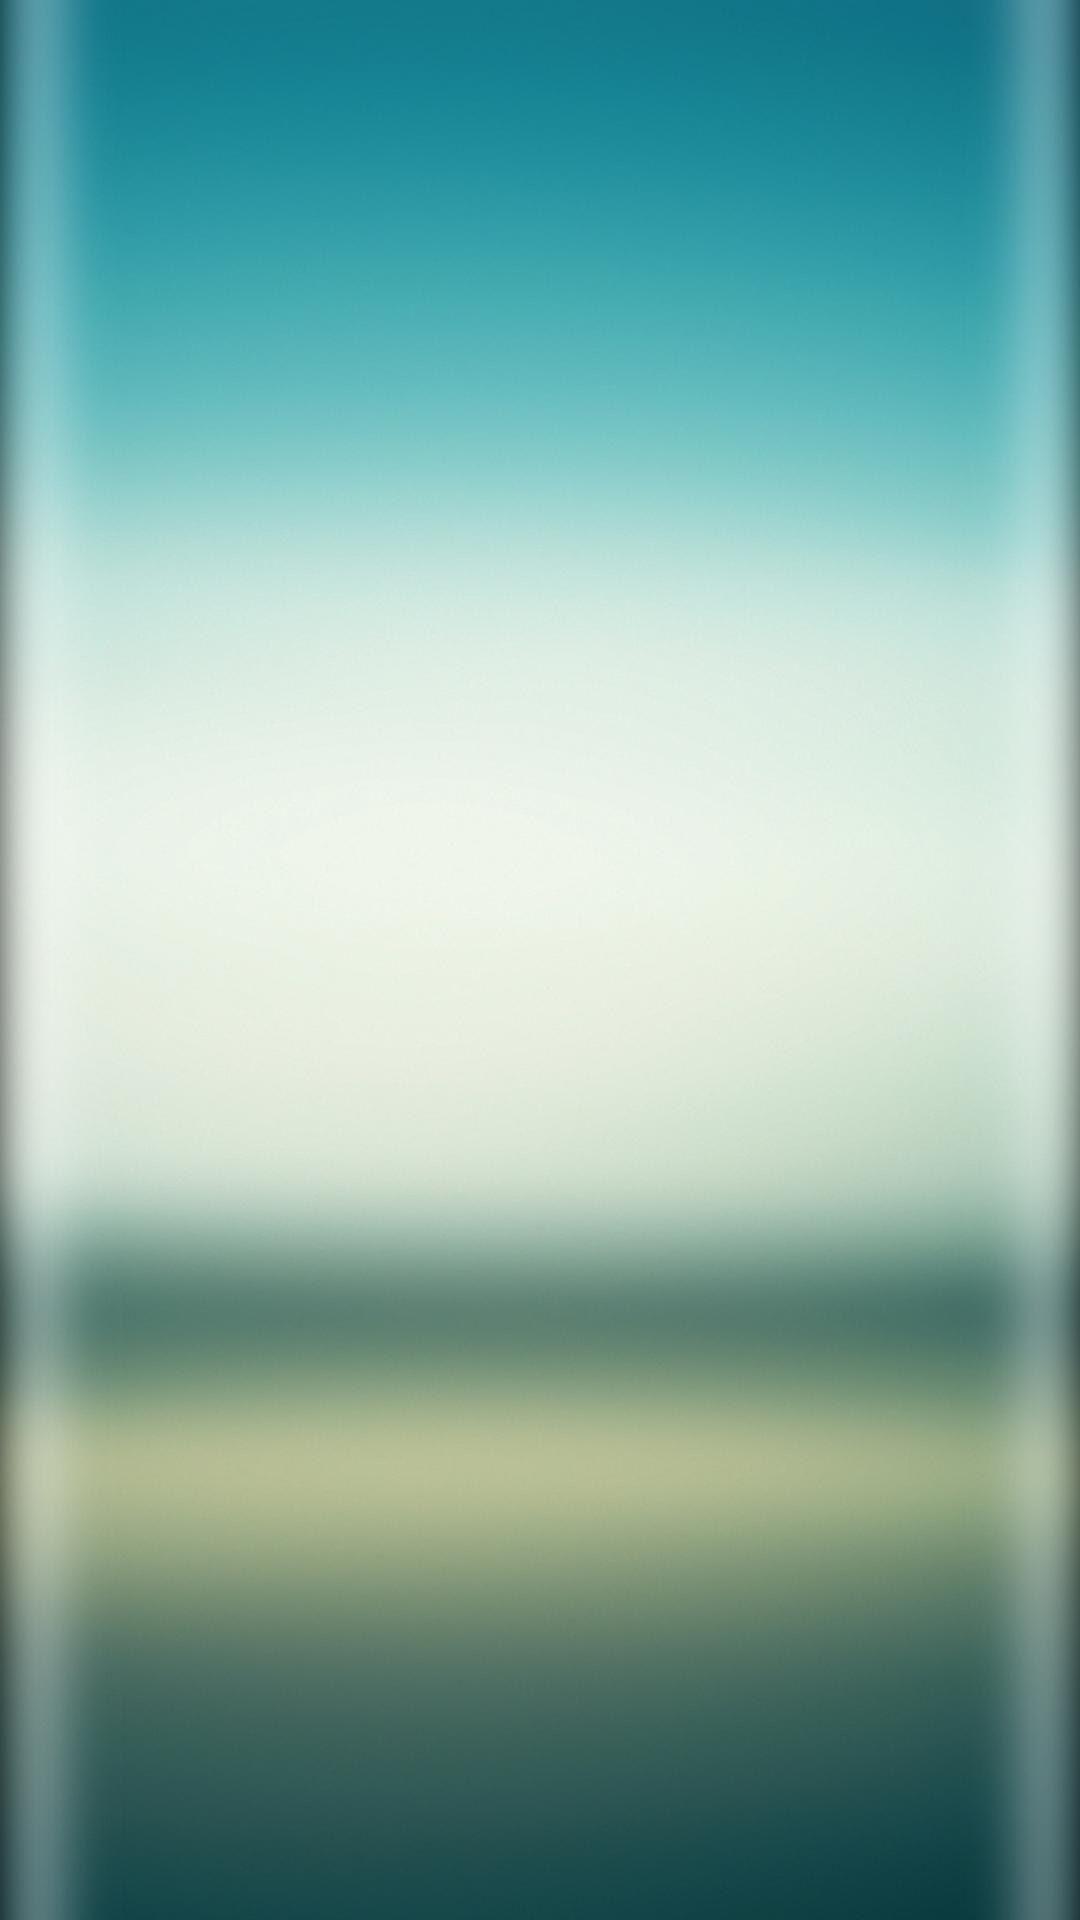 Mobile Full Screen Wallpaper Hd - HD Wallpaper